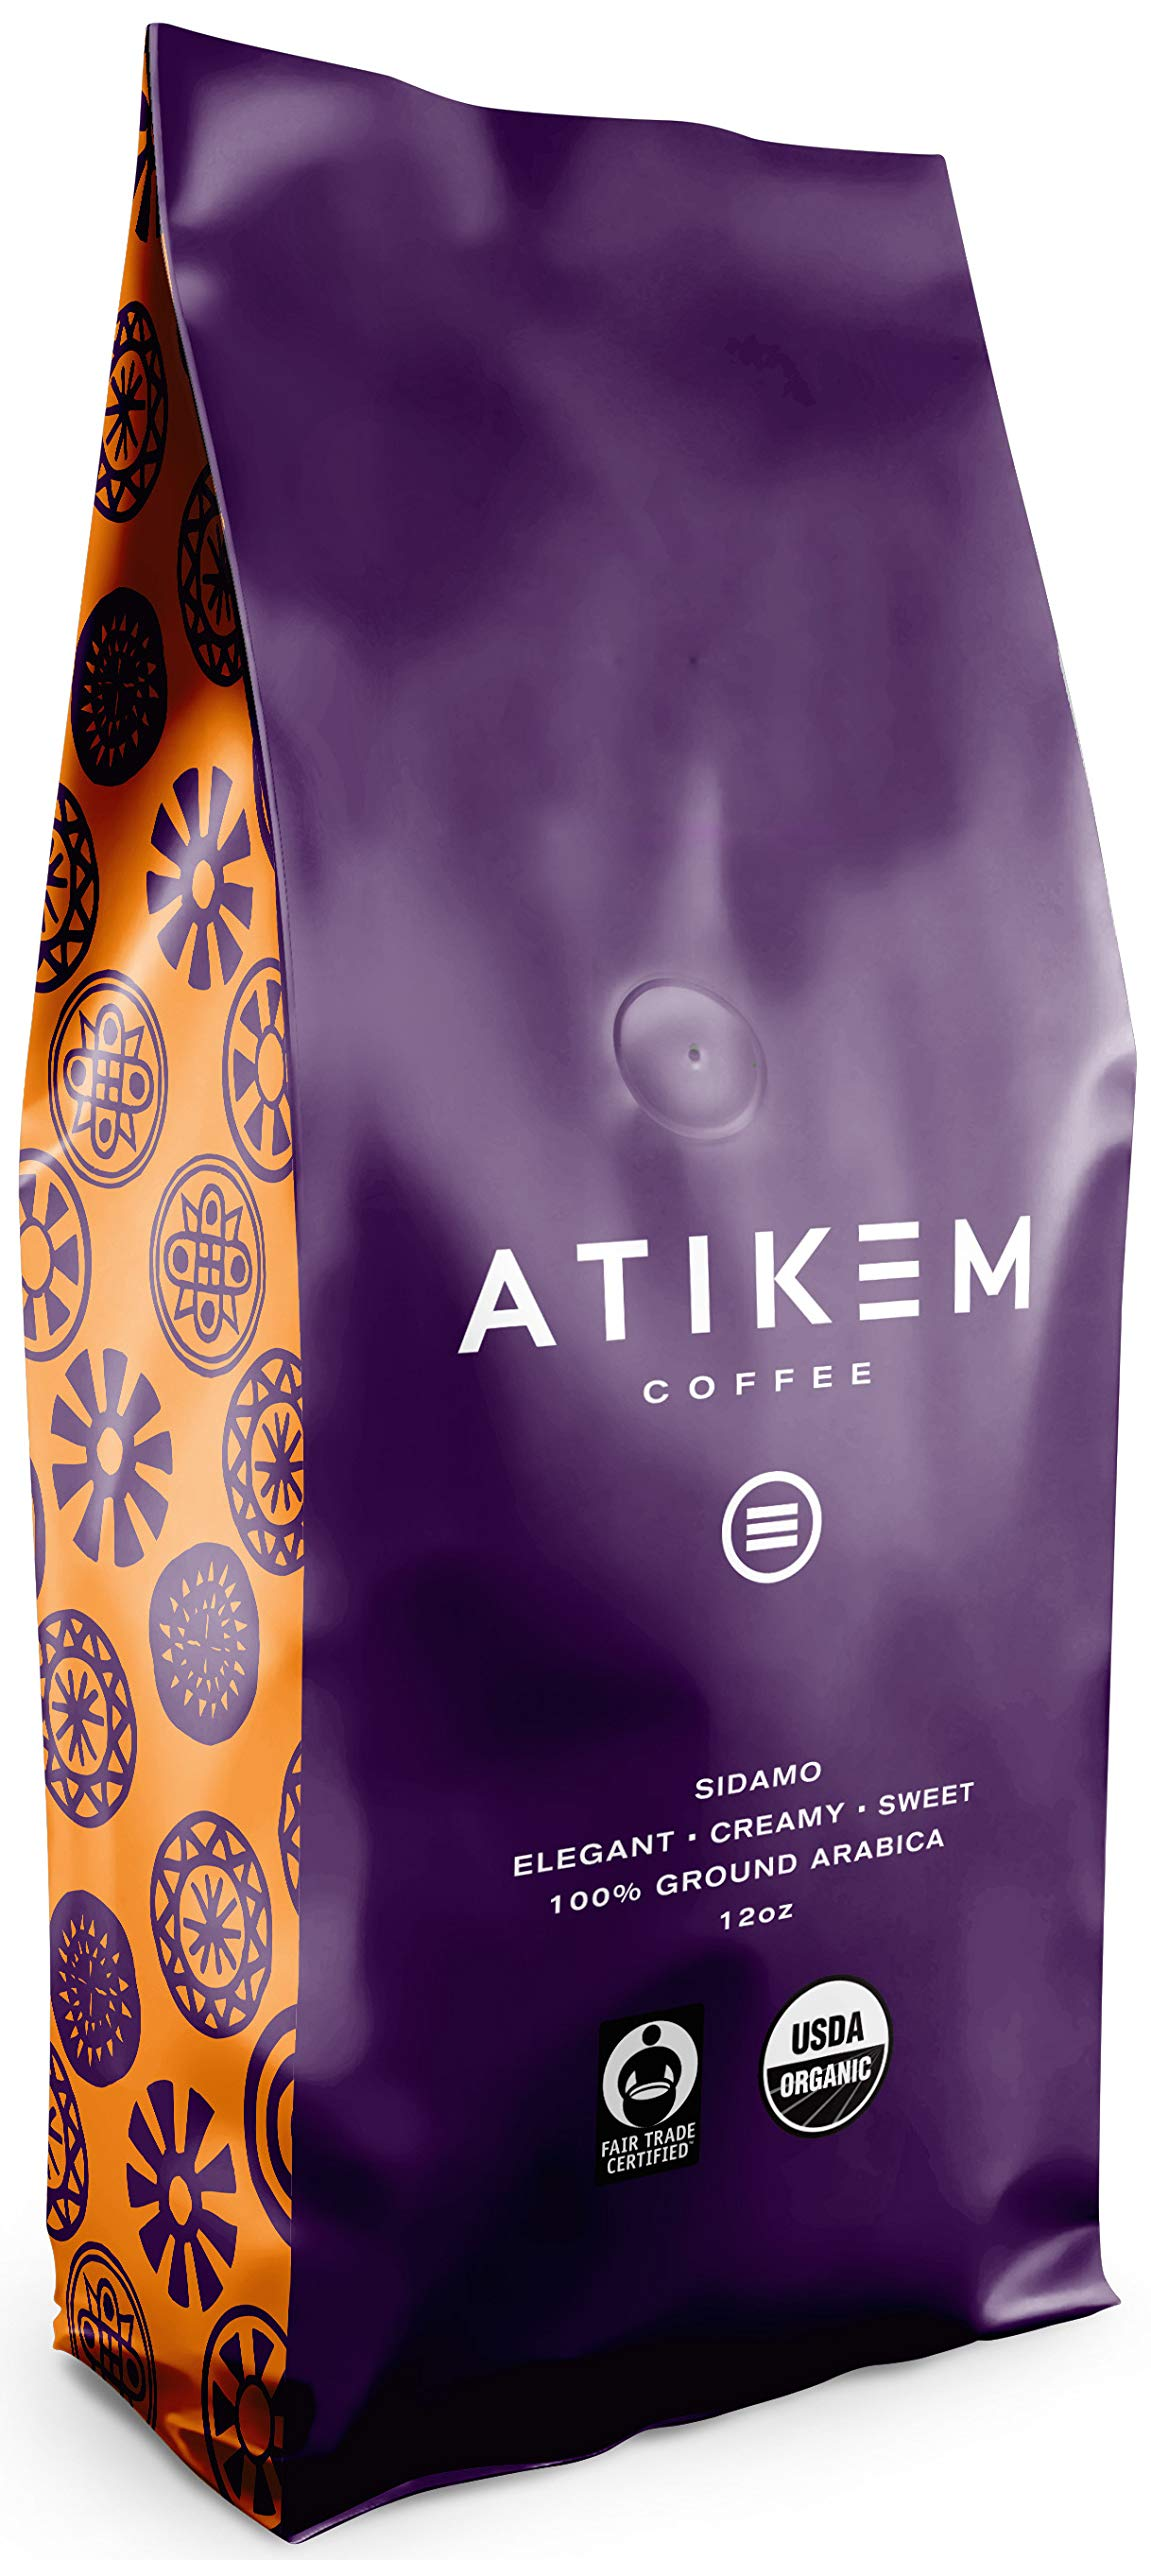 ATIKEM Organic Ethiopian Sidamo Coffee Ground, Creamy Medium Roast, 100% Premium Arabica Coffee, USDA Organic Fairtrade Certified Coffee (12 ounce) (Pack of 1)